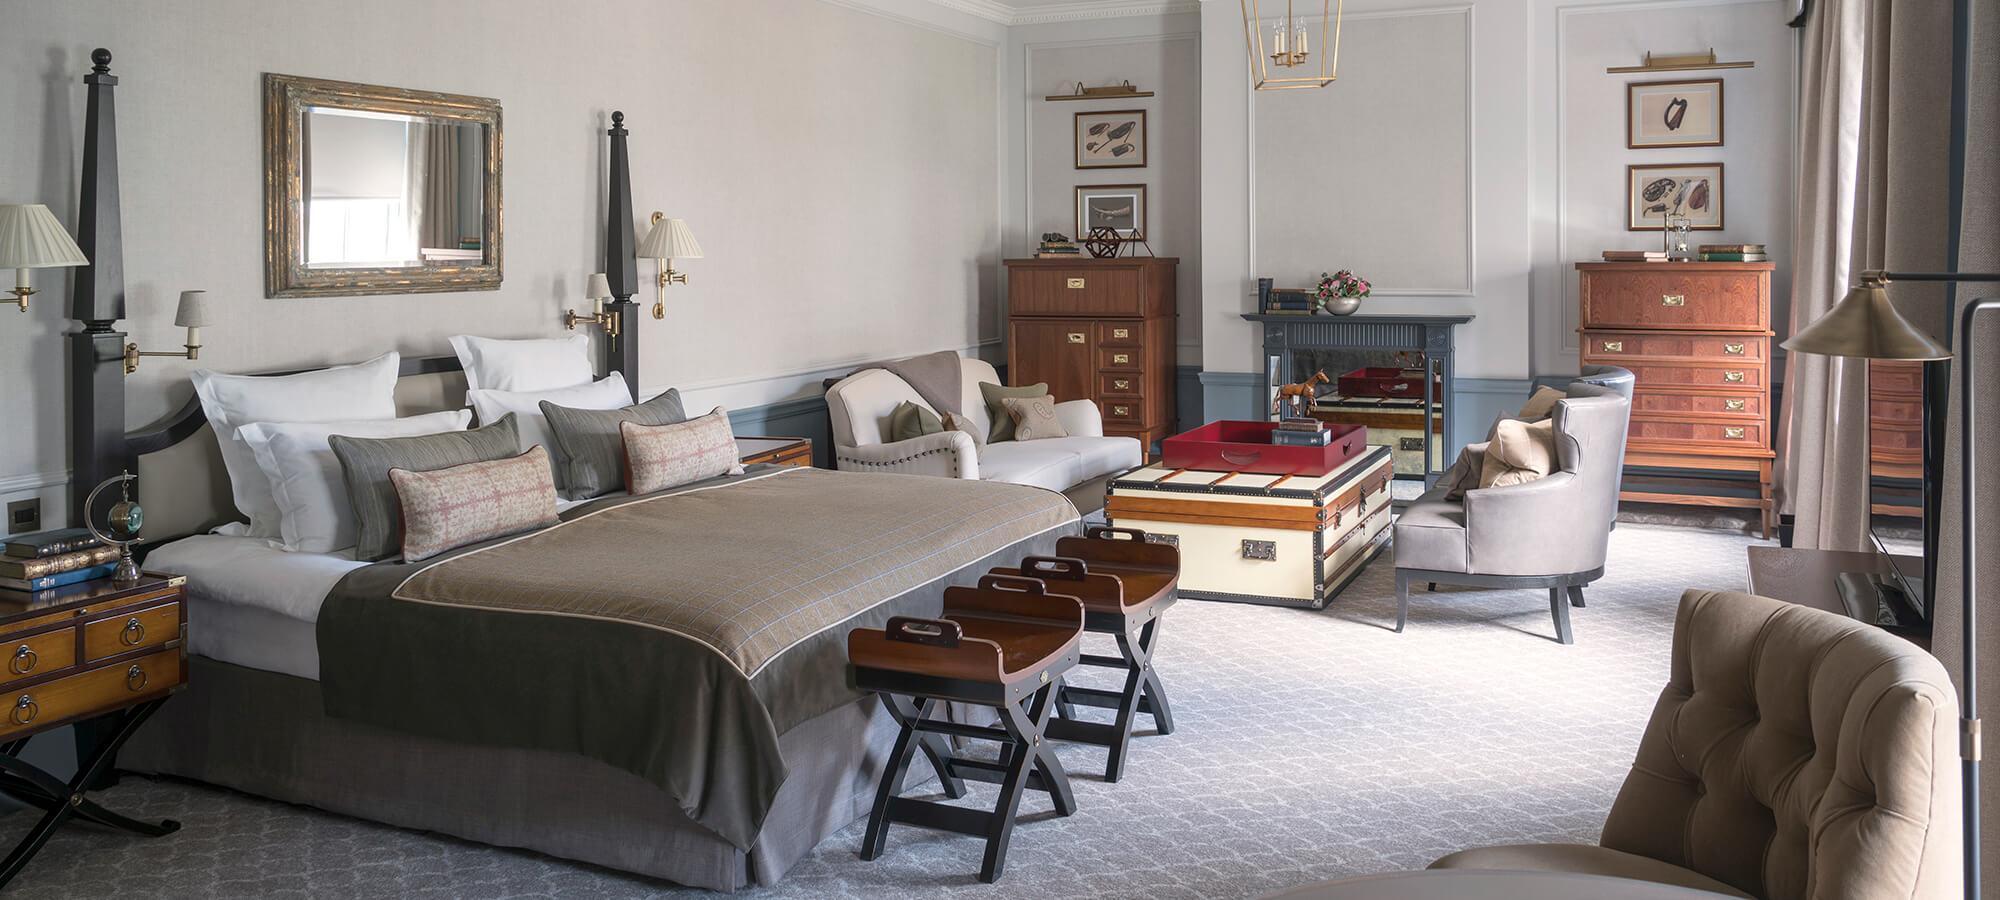 Luxury Manor Bedrooms Gleneagles